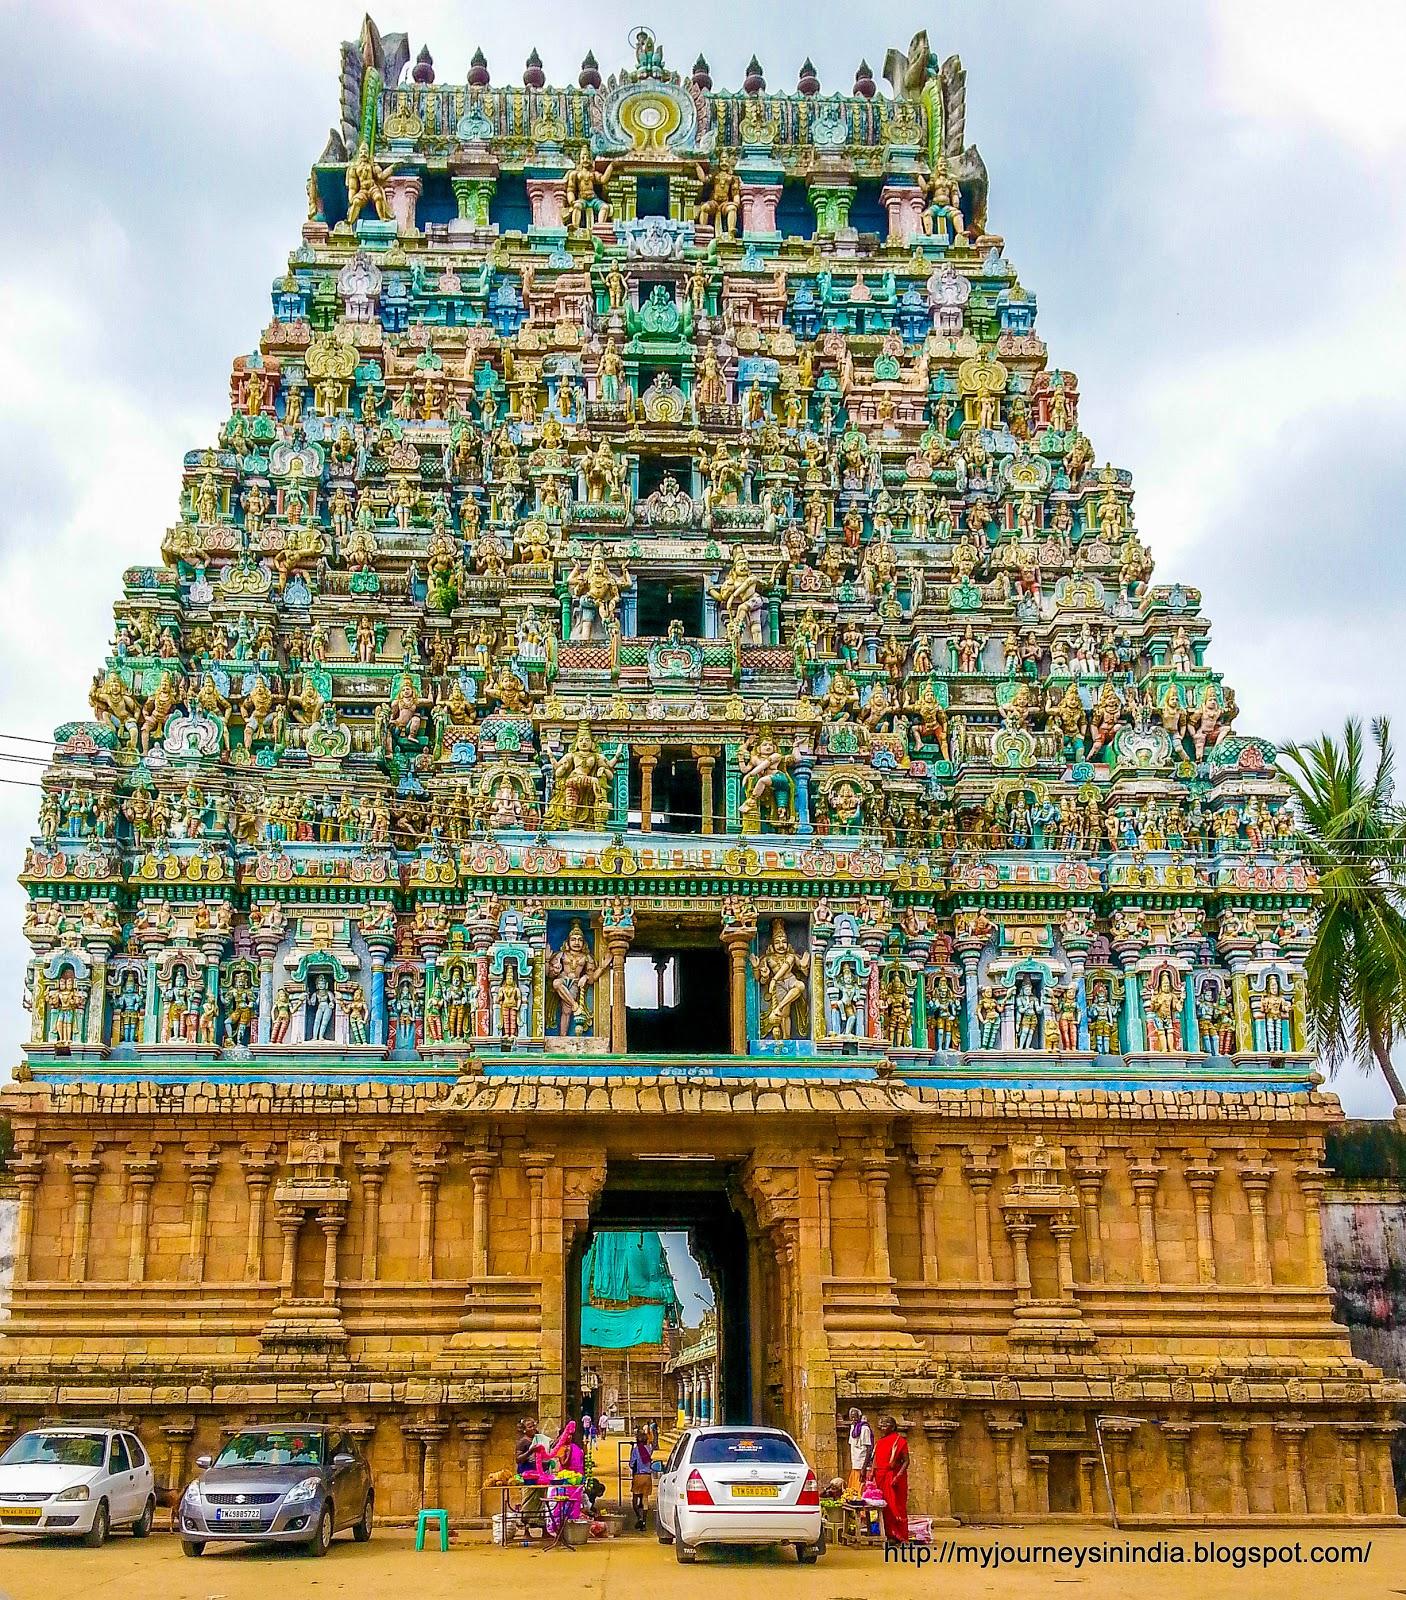 Pateeshwaram Thenupuriswarar Temple